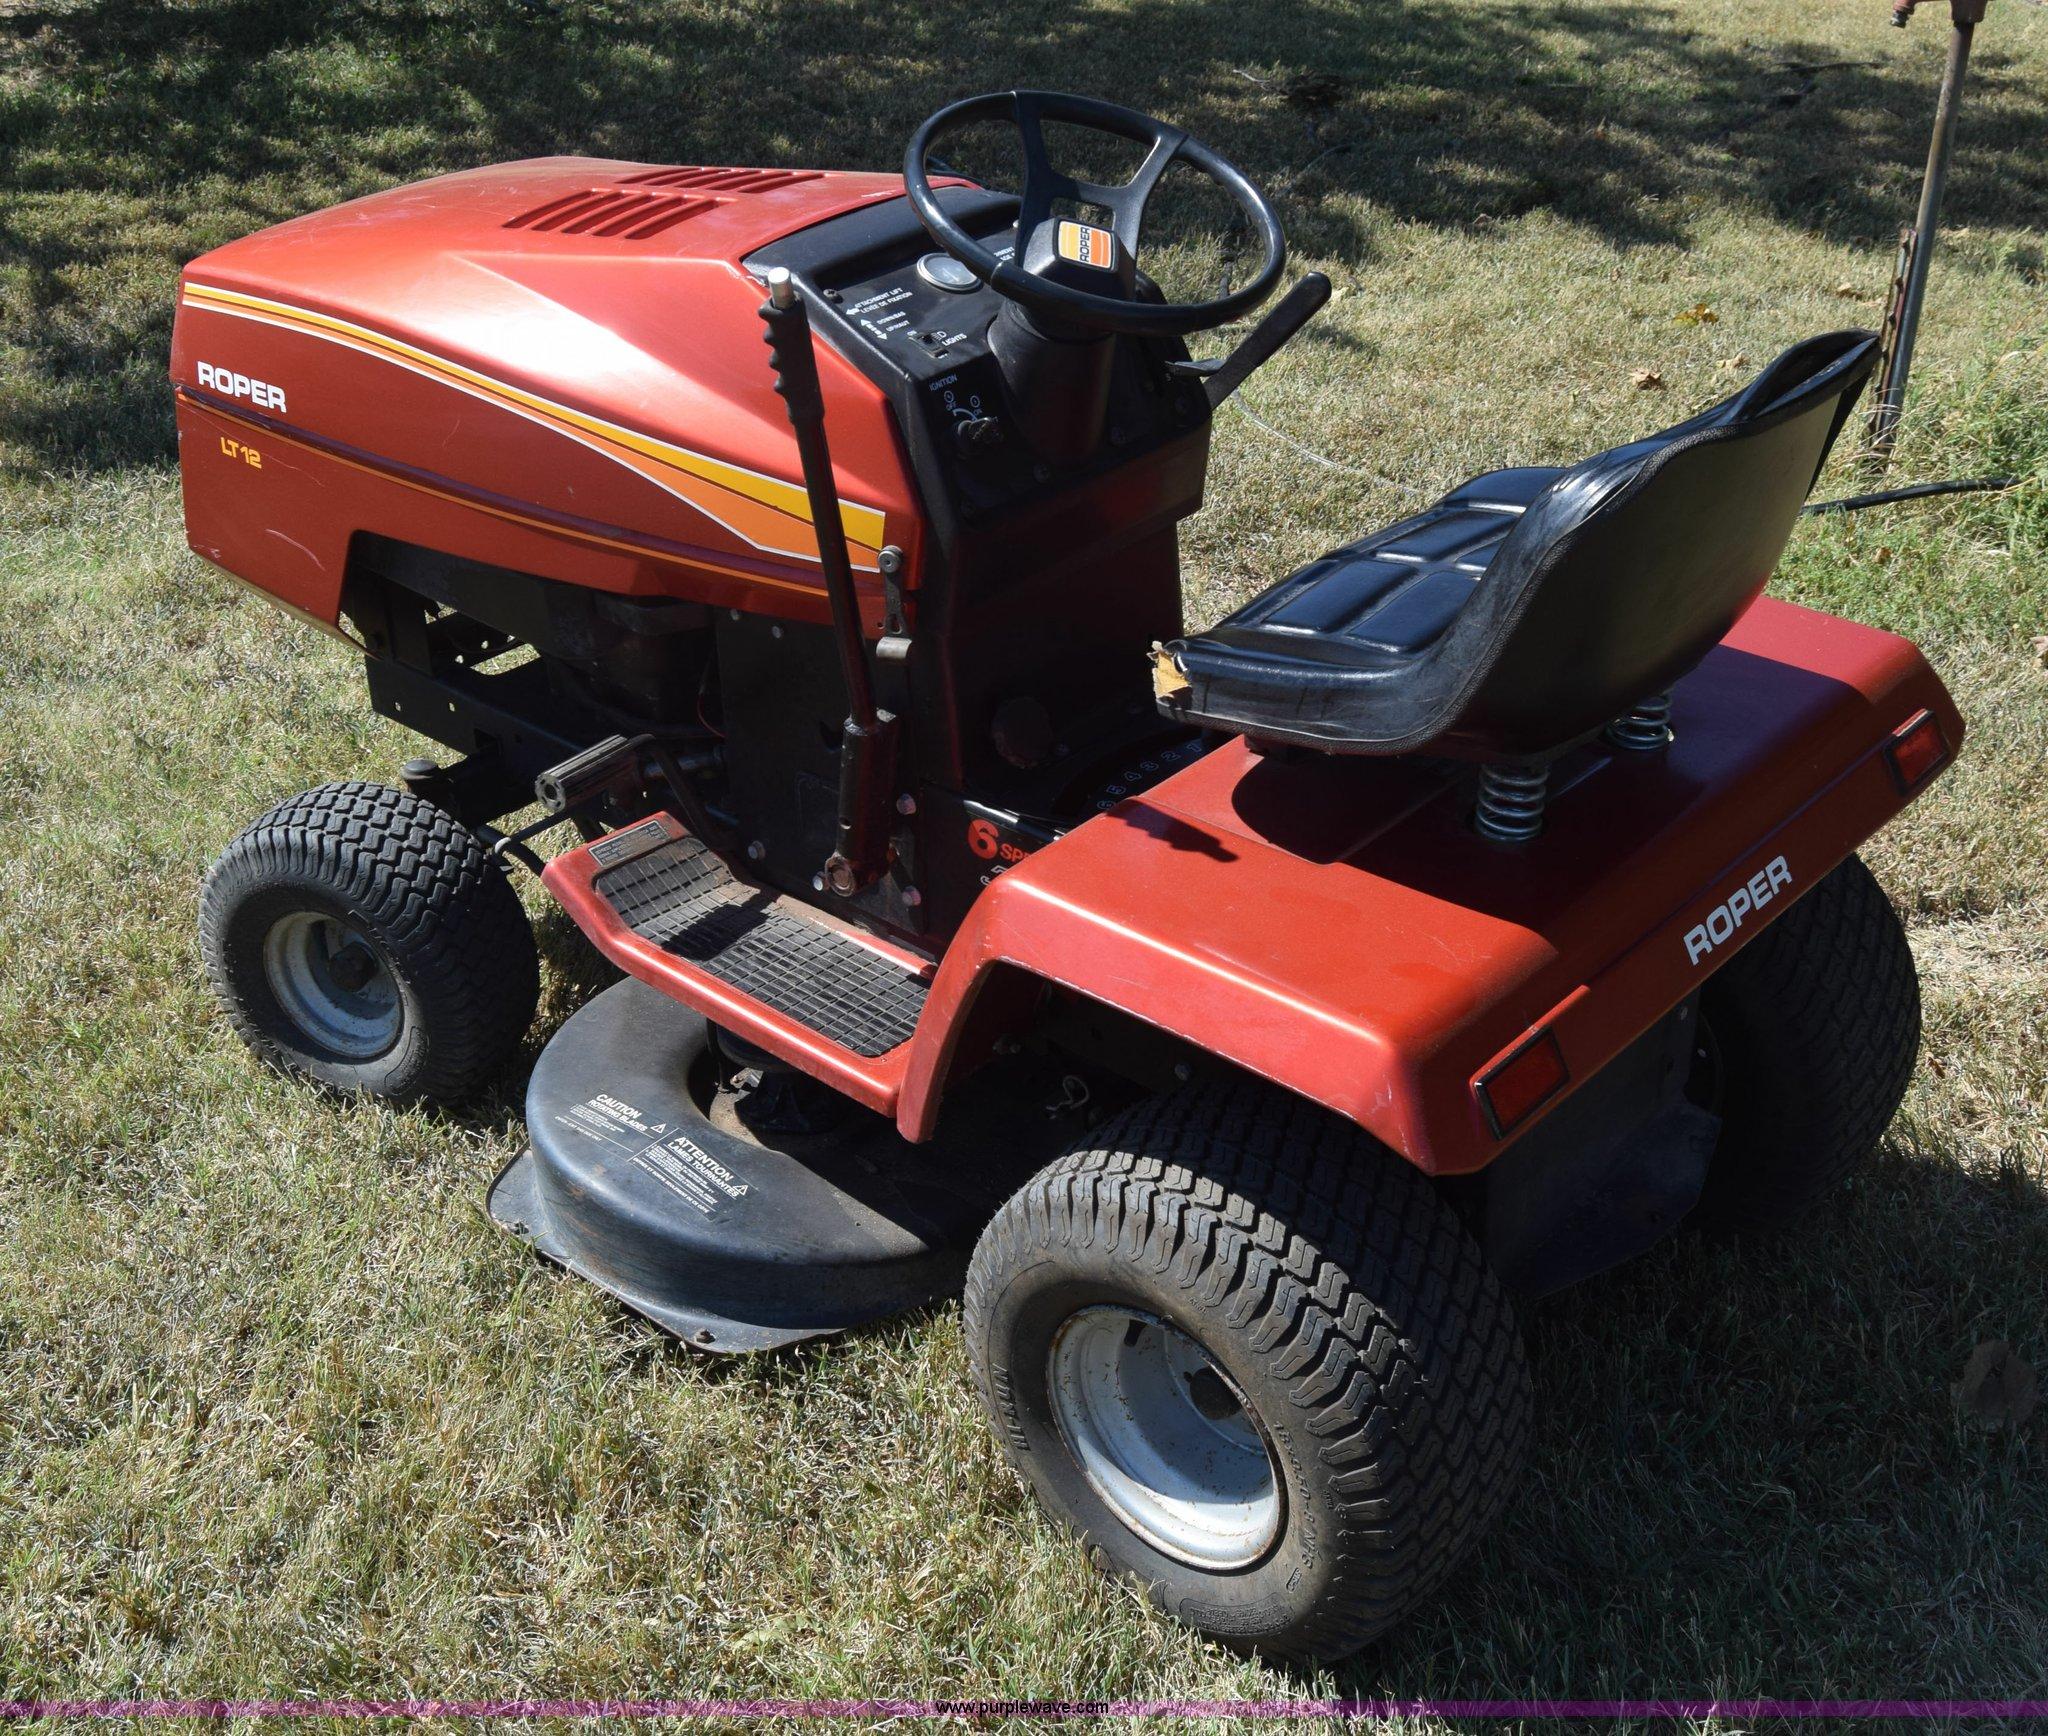 Roper Lawn Mower Manual Wiring Diagram For Item Sold October Ag Equi 2048x1736